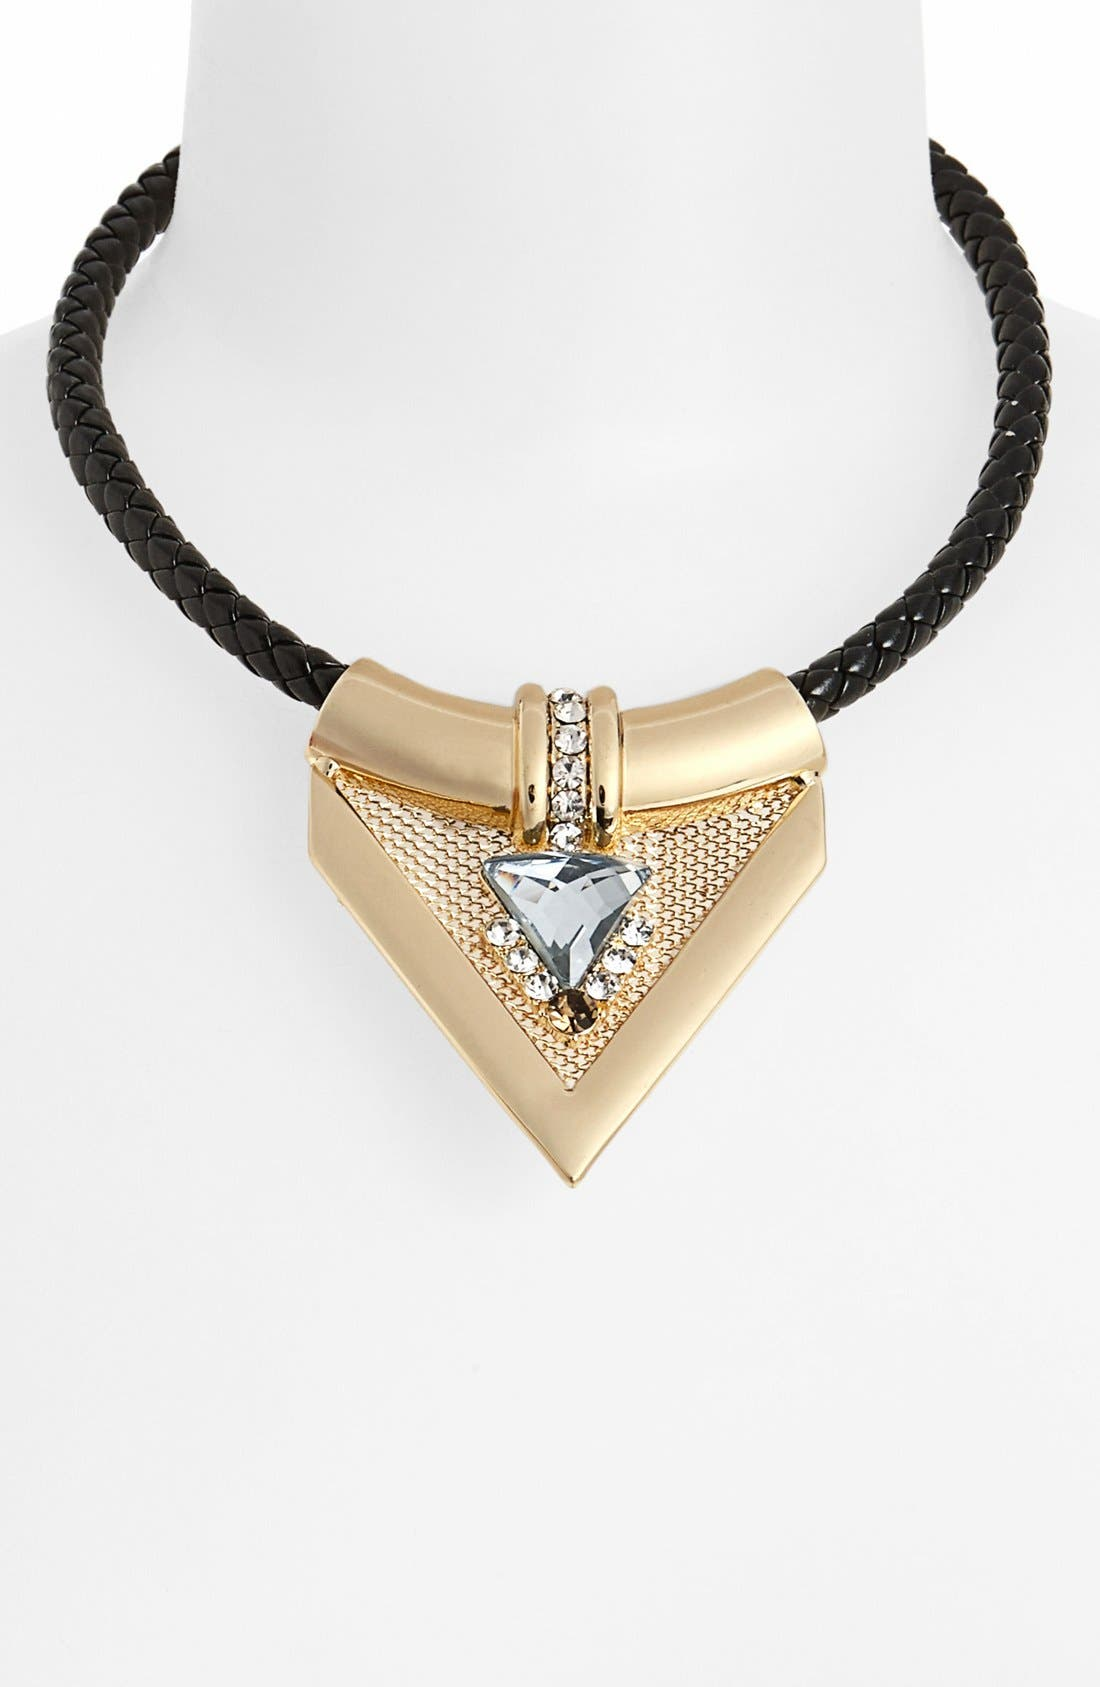 Main Image - Topshop 'Luxe' Triangular Pendant Collar Necklace